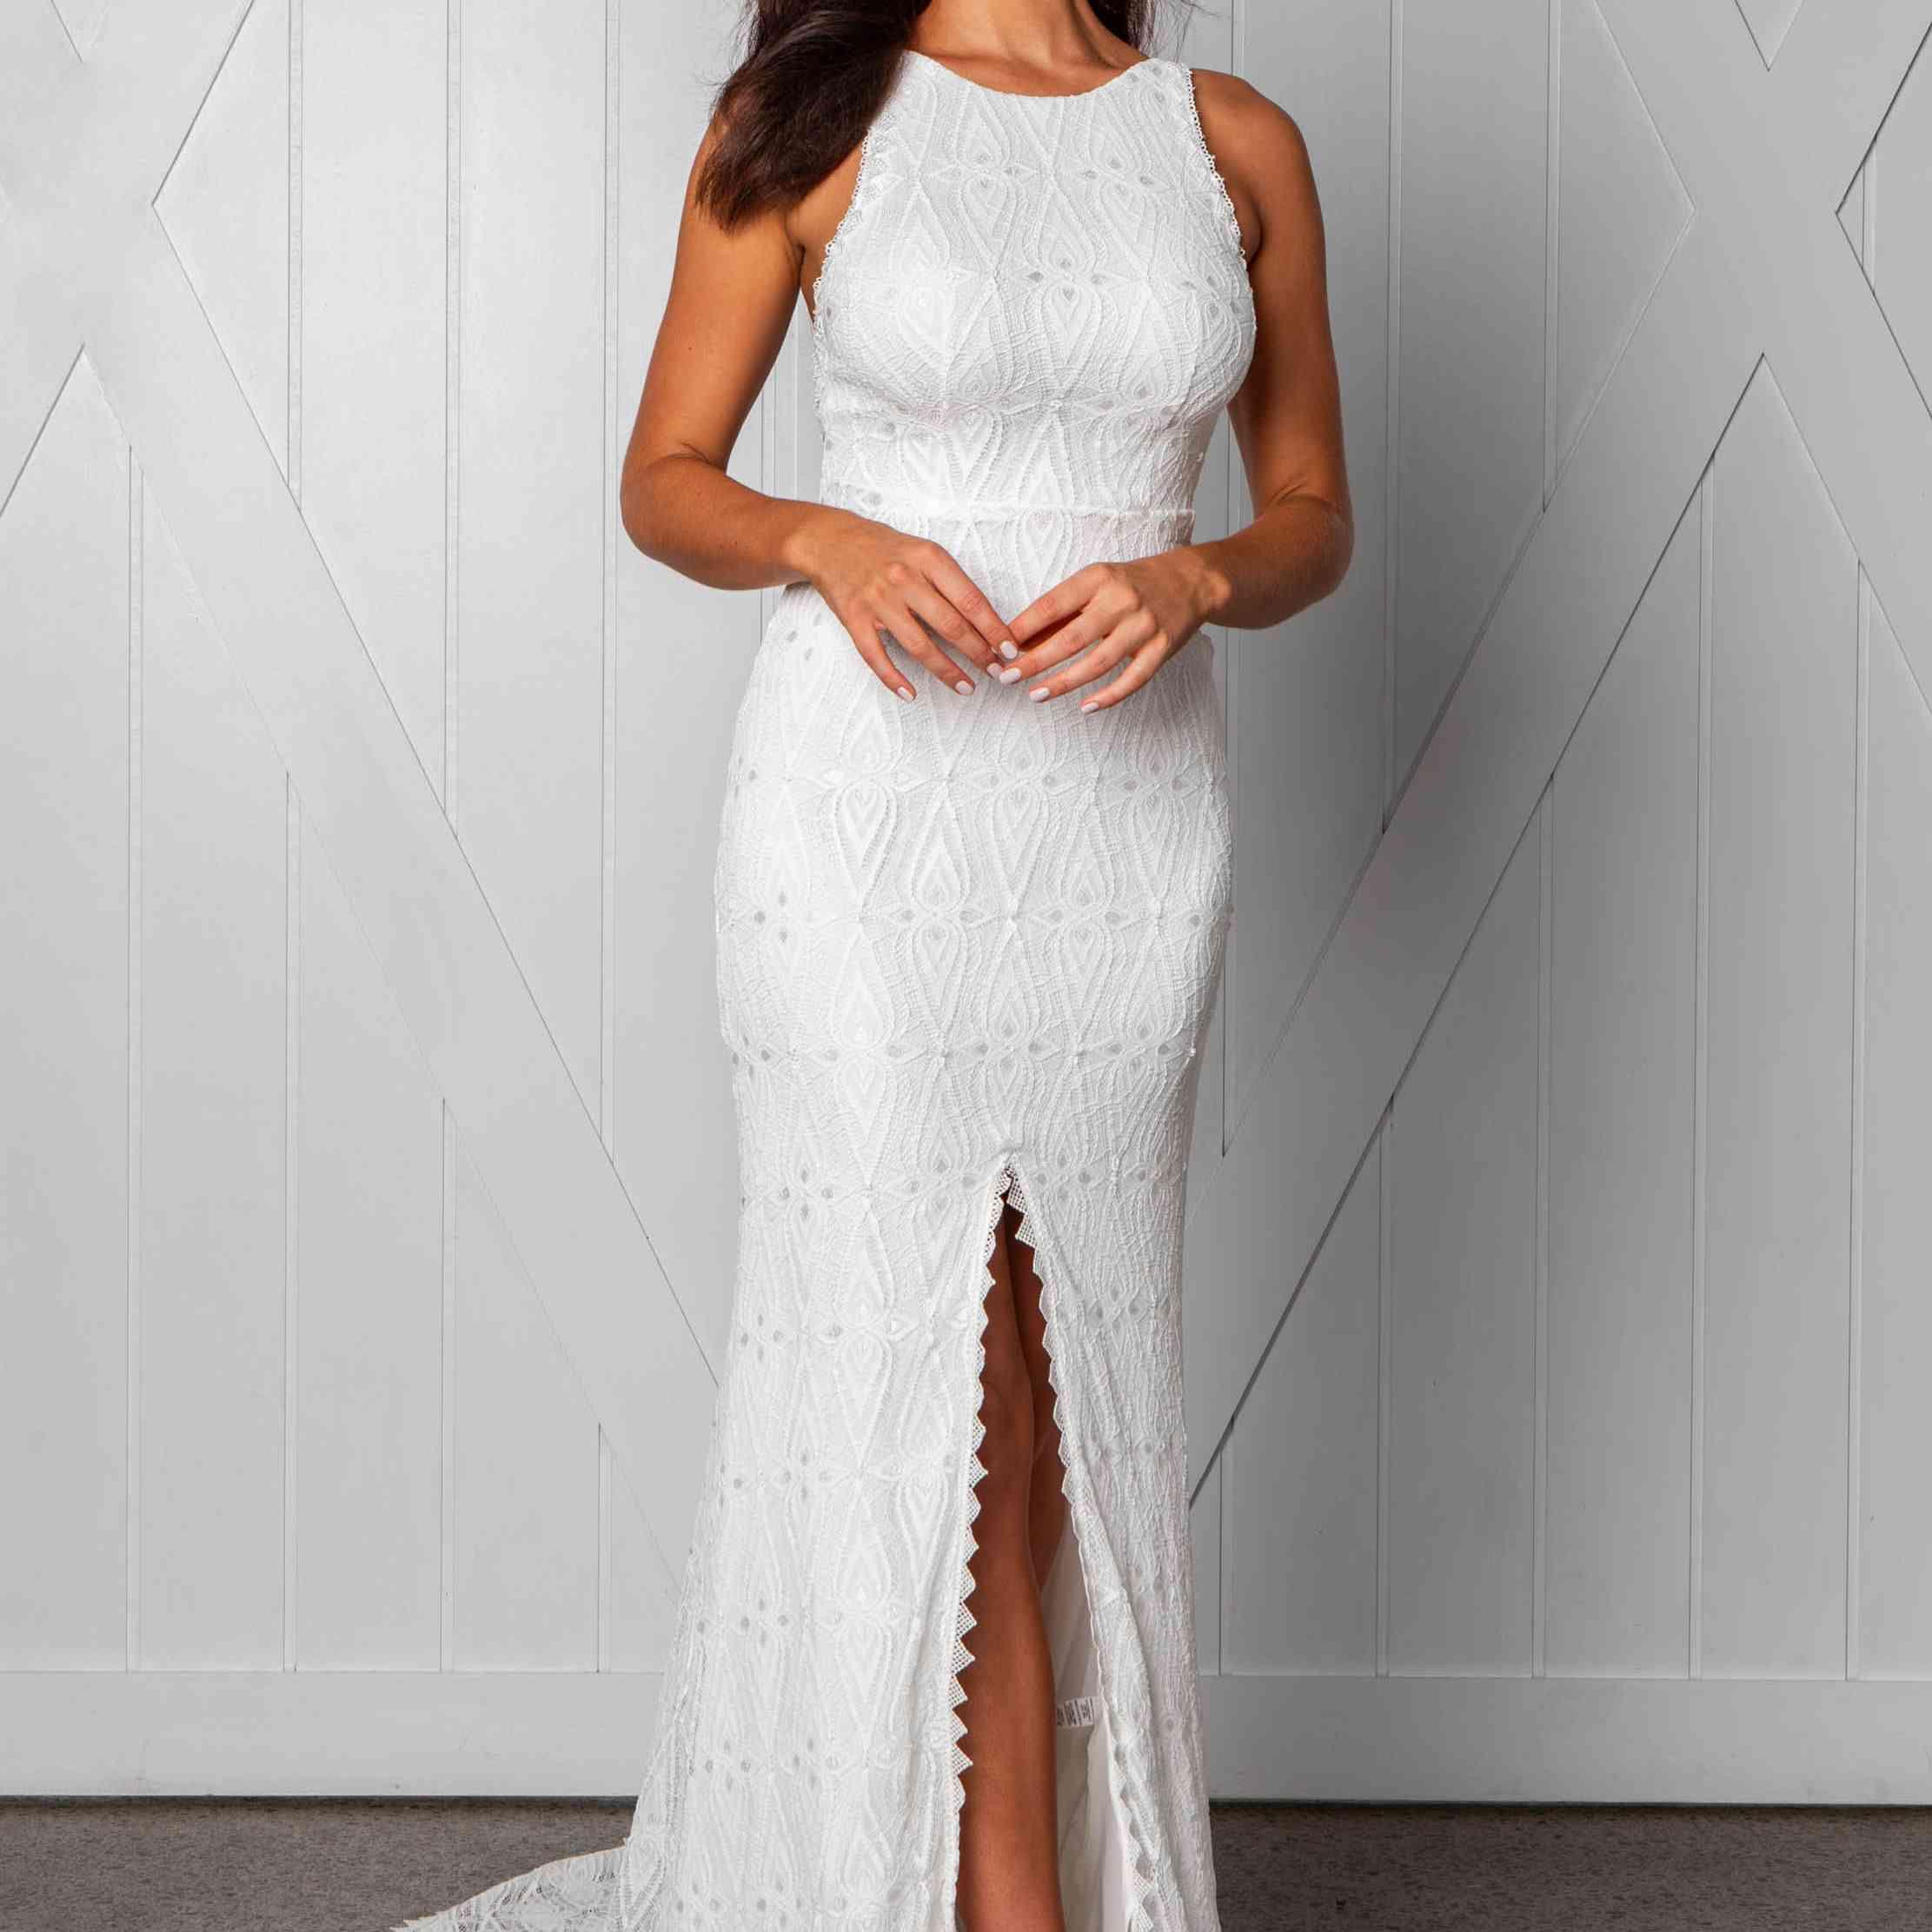 Leon sleeveless wedding dress